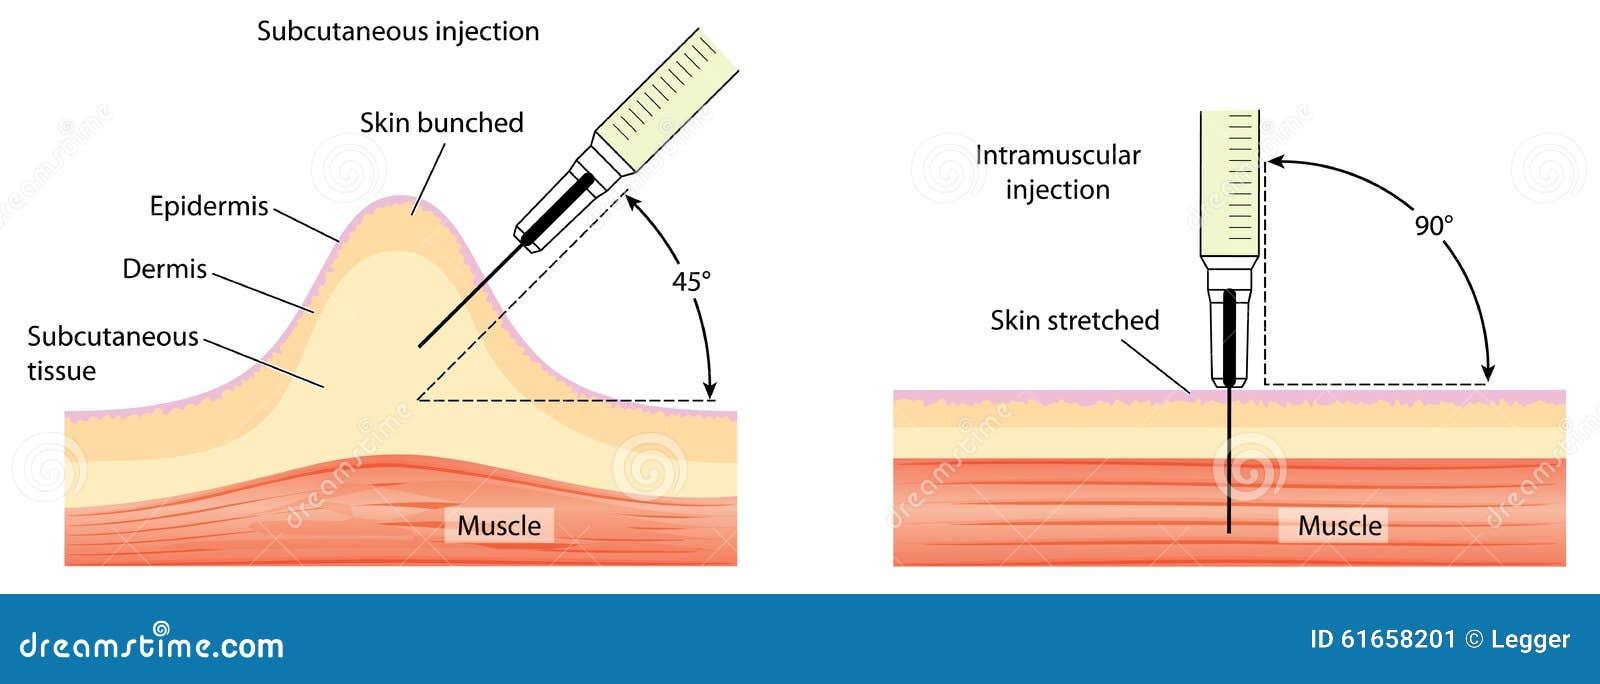 vacuna intramuscular subcutanea